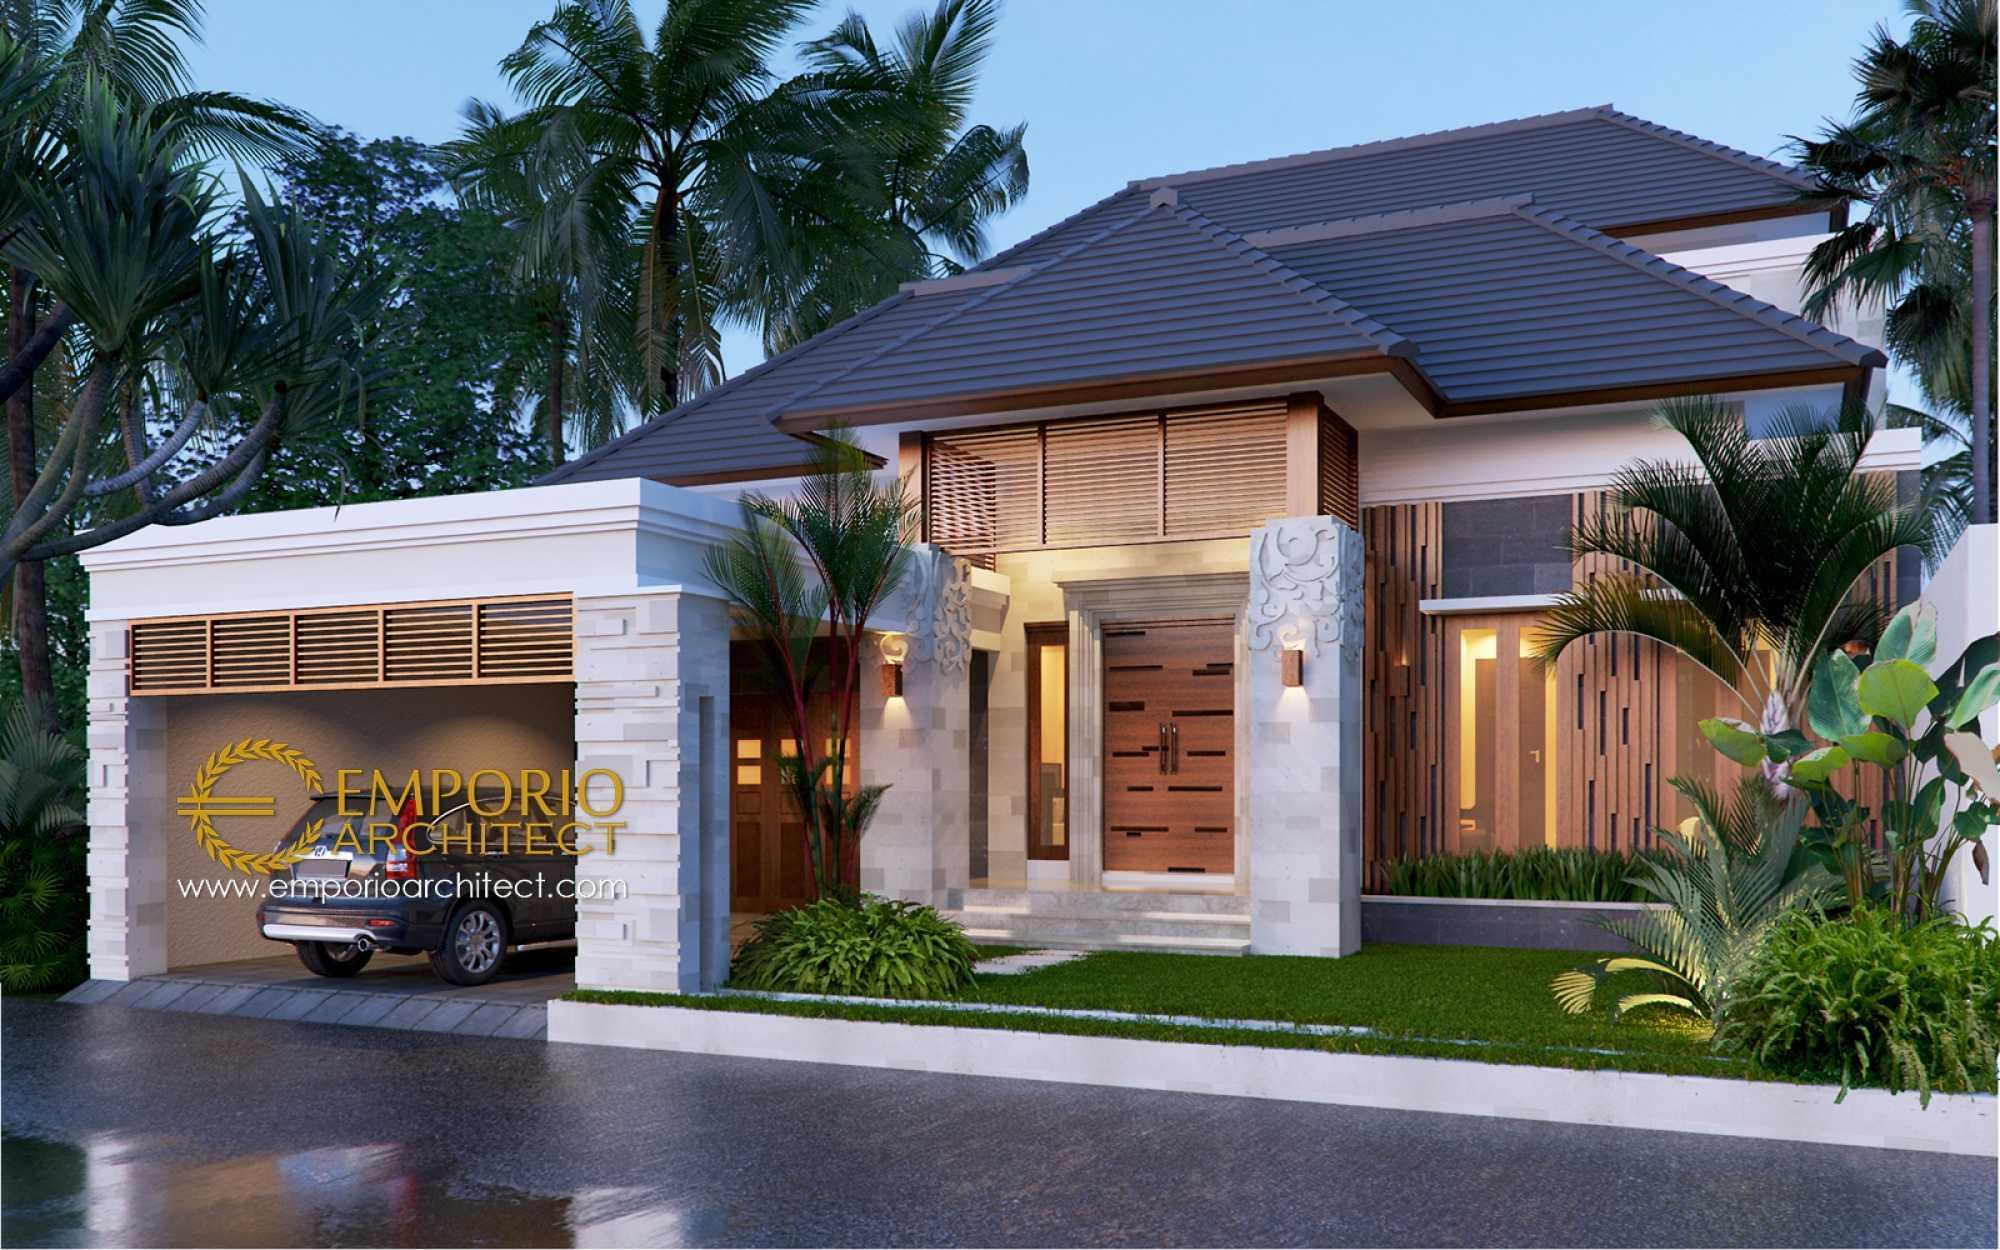 Emporio Architect Desain Rumah Villa Bali Tropis 381 @ Jawa Tengah Jawa Tengah, Indonesia Jawa Tengah, Indonesia Emporio-Architect-Desain-Rumah-Villa-Bali-Tropis-381-Jawa-Tengah Tropical  76575